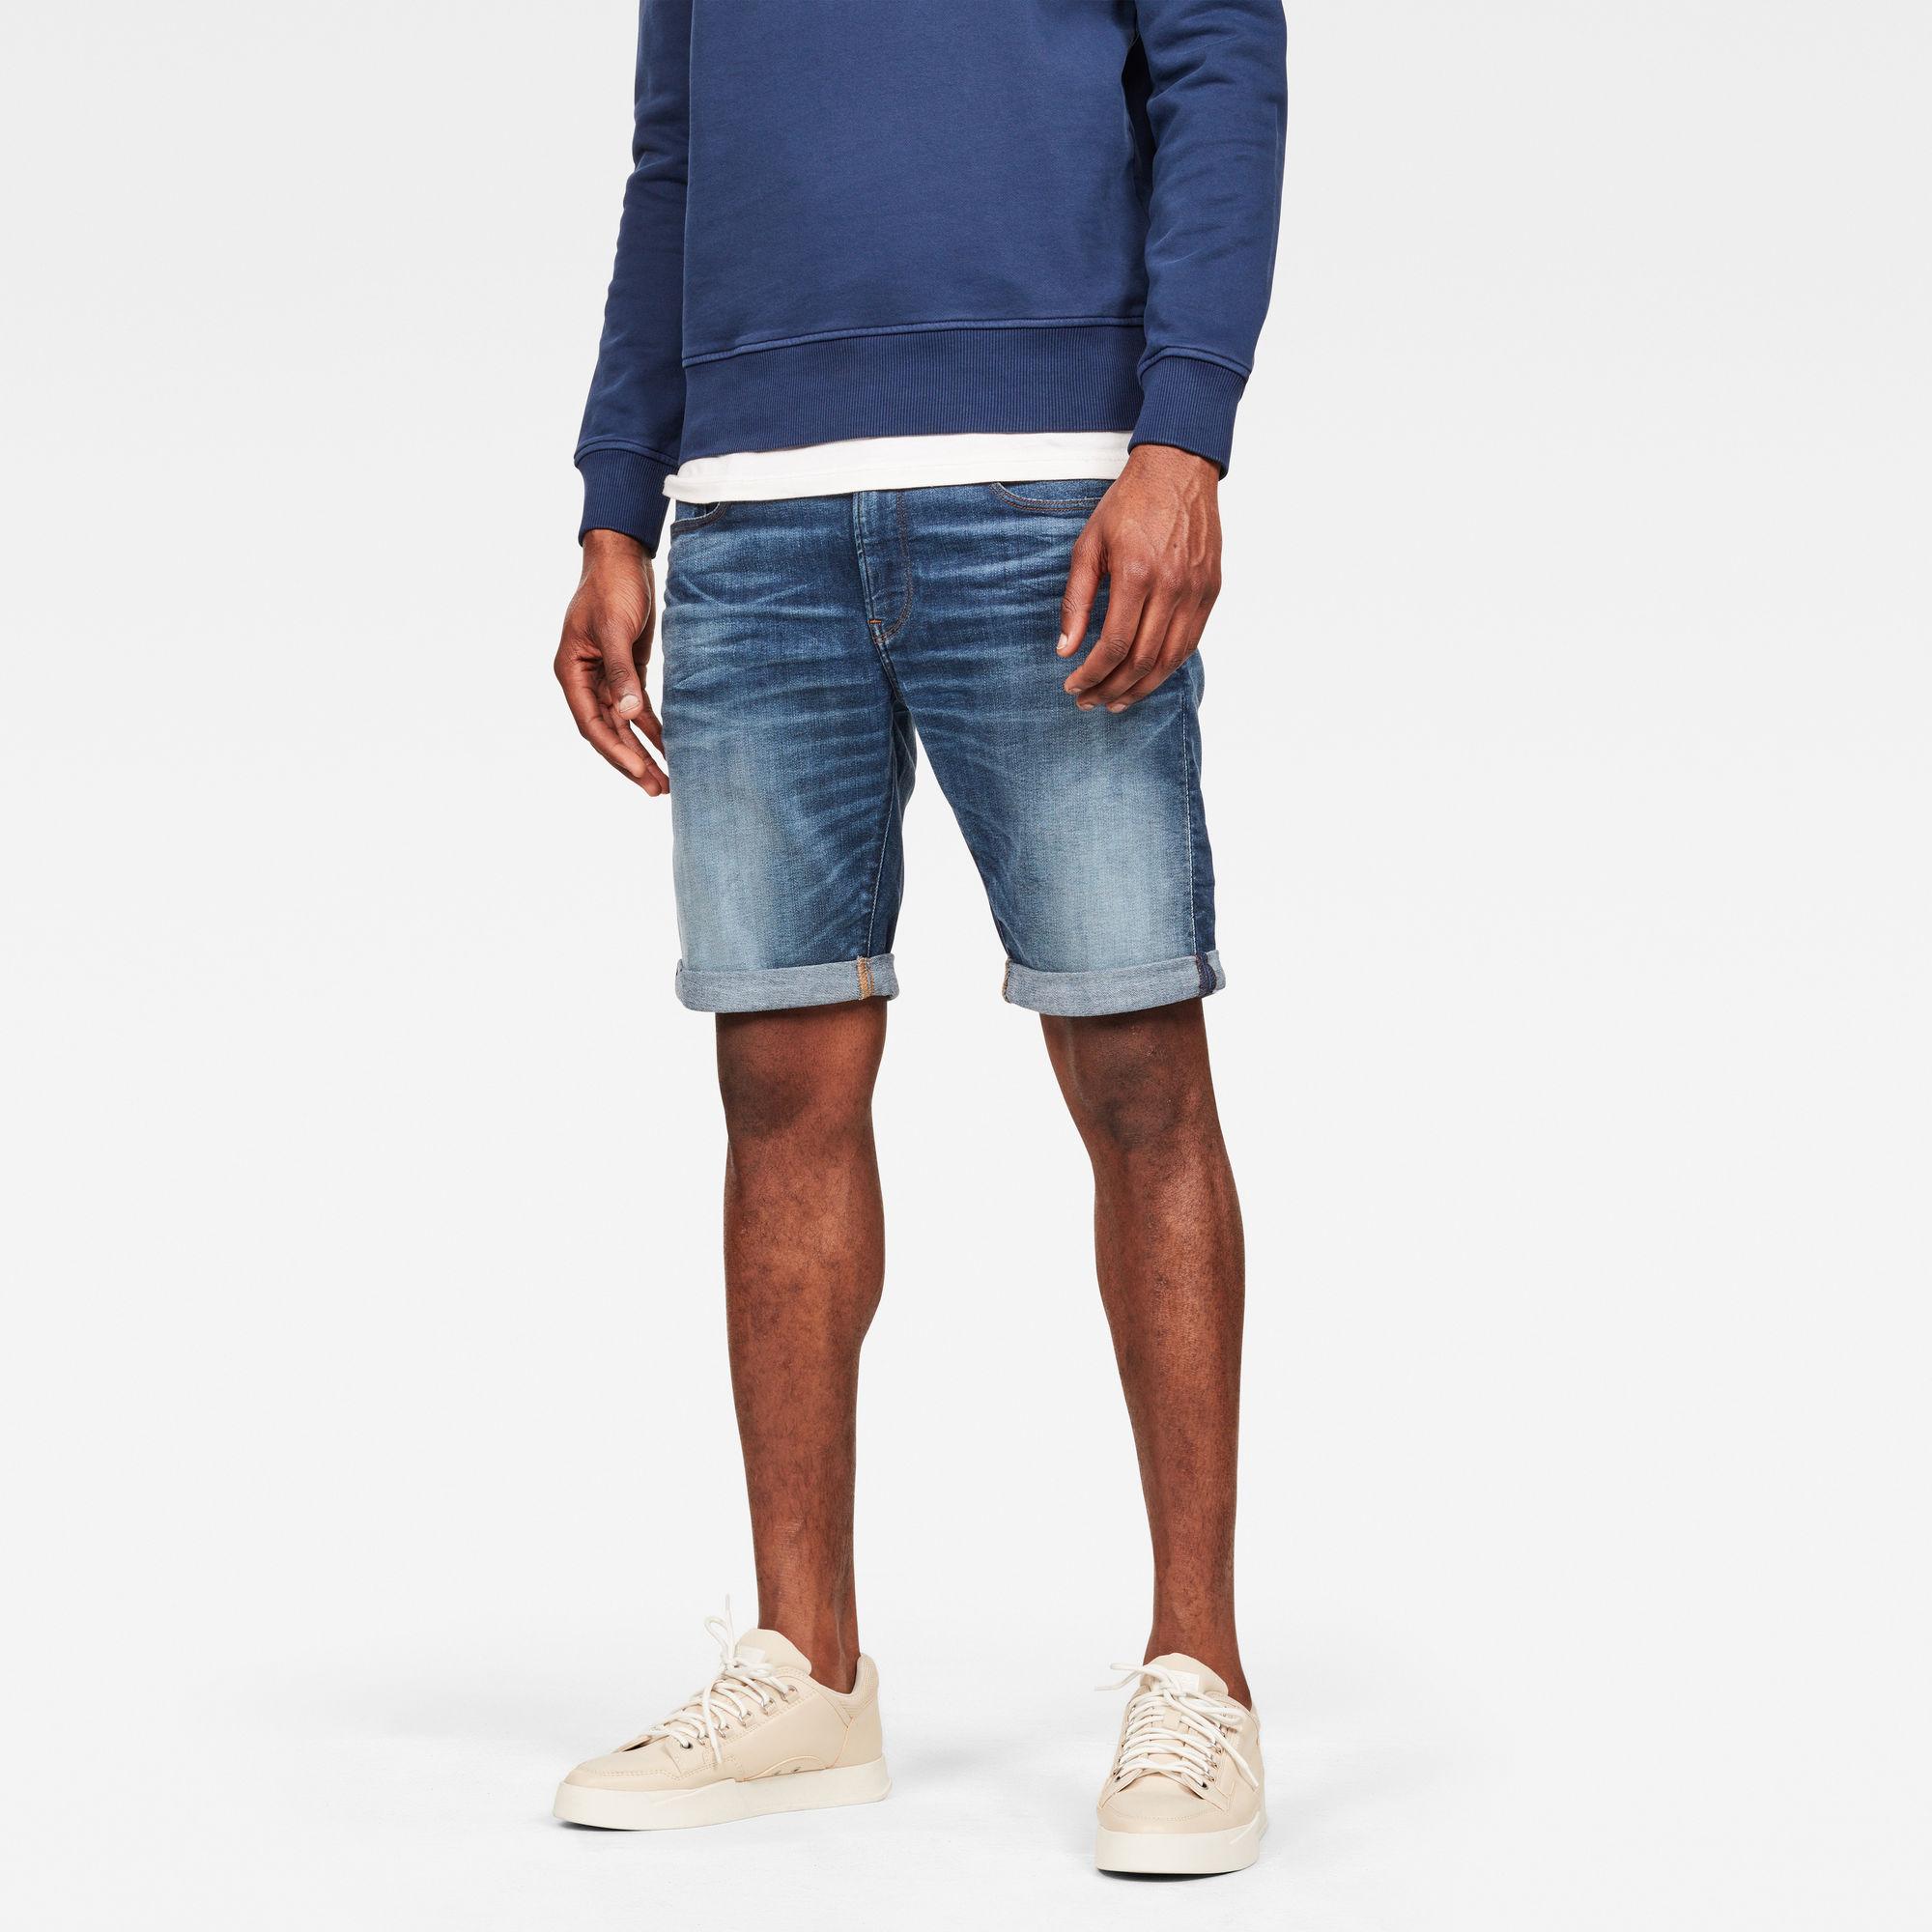 Image of G Star Raw 3301 Slim 1\2 Shorts